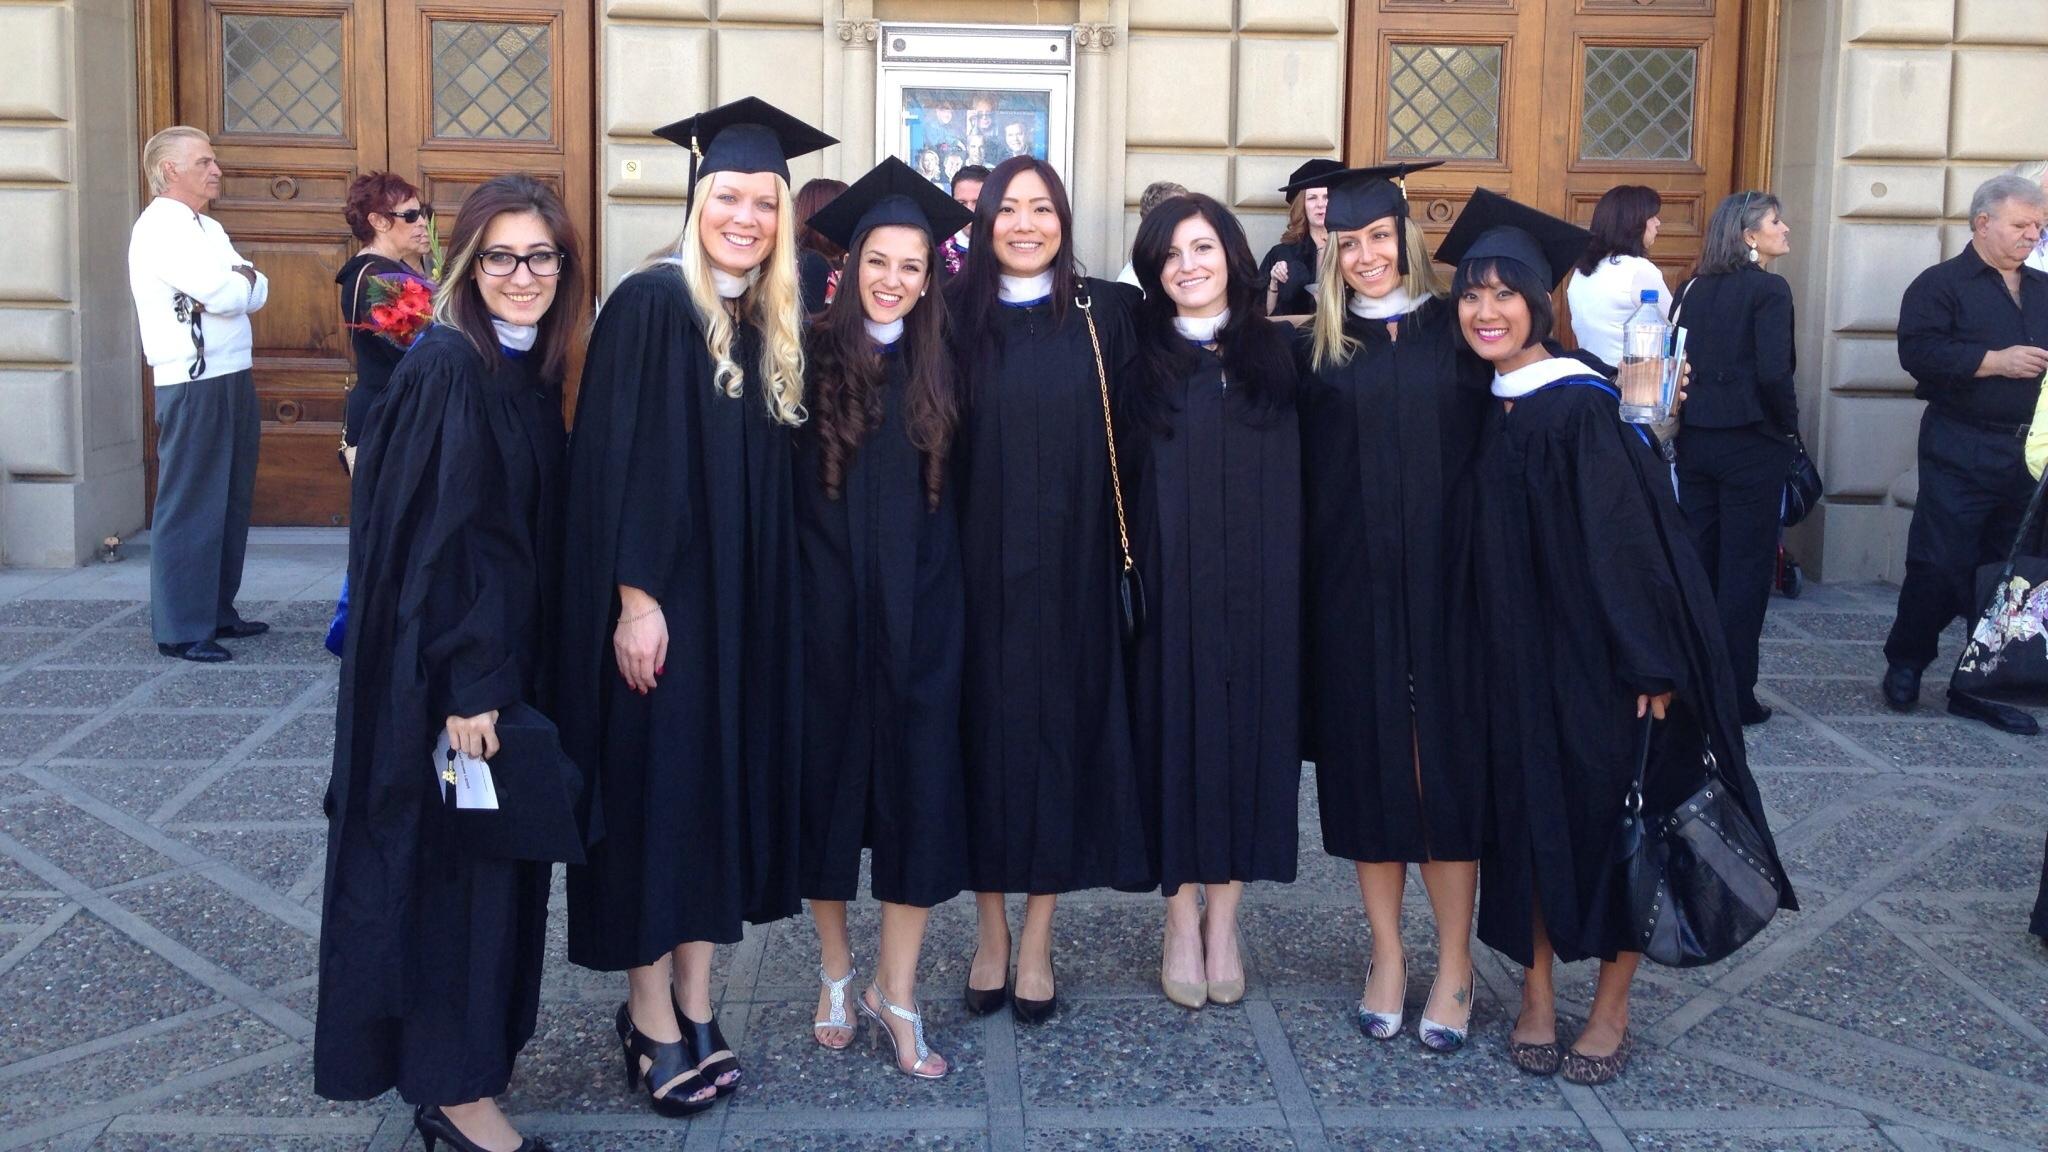 L to R: Rachel Liptak, Audrey Milburn, Nancy Flores, Ashley Hahn, Michelle Dastmalchi, Kaylin Zabienski, Me